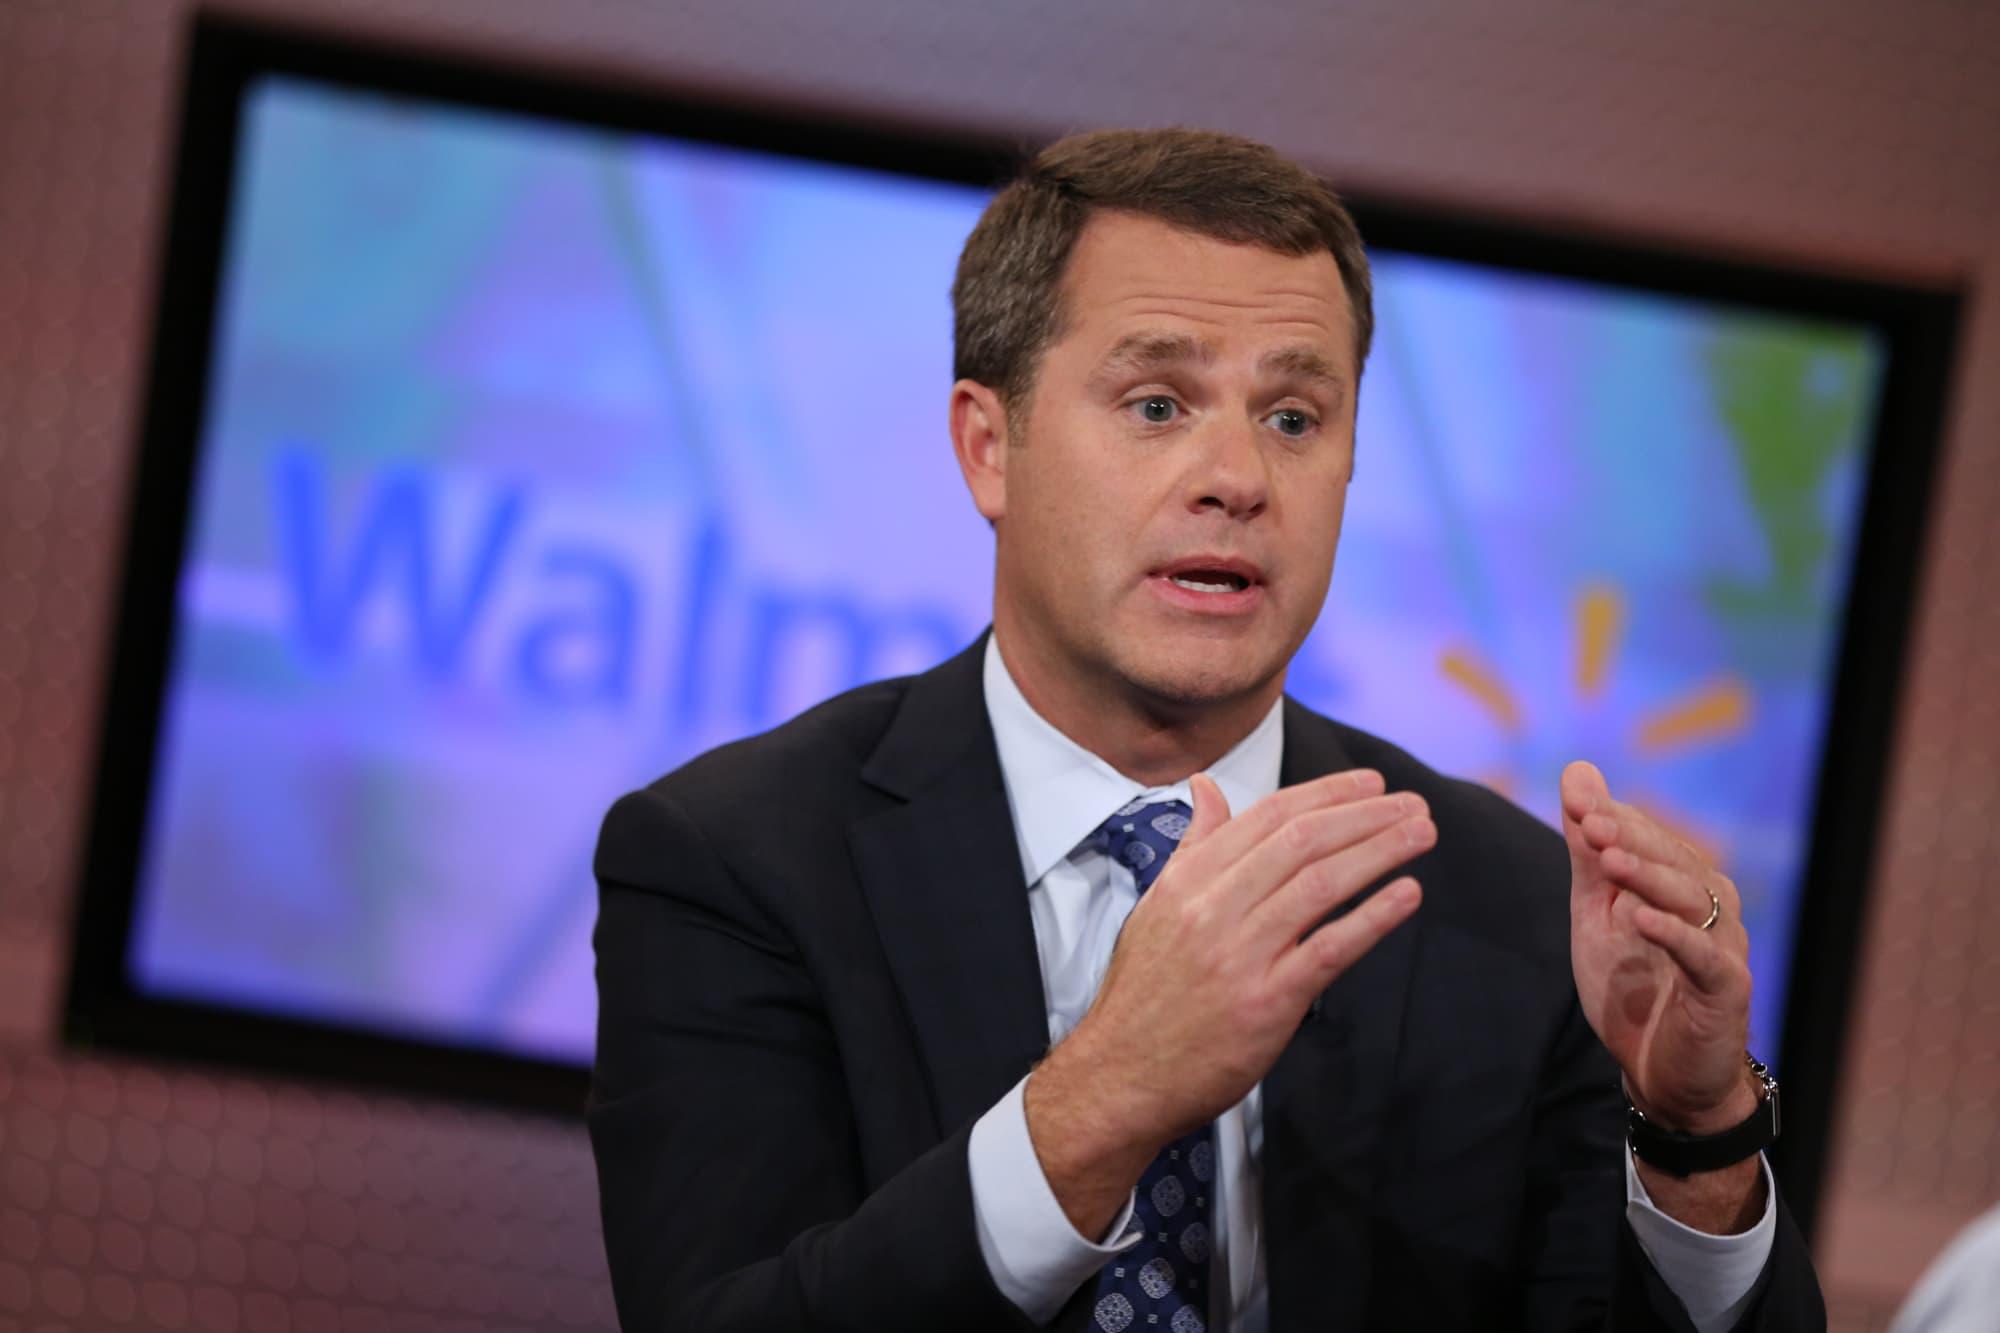 Walmart's online sales are soaring despite Amazon's dominance